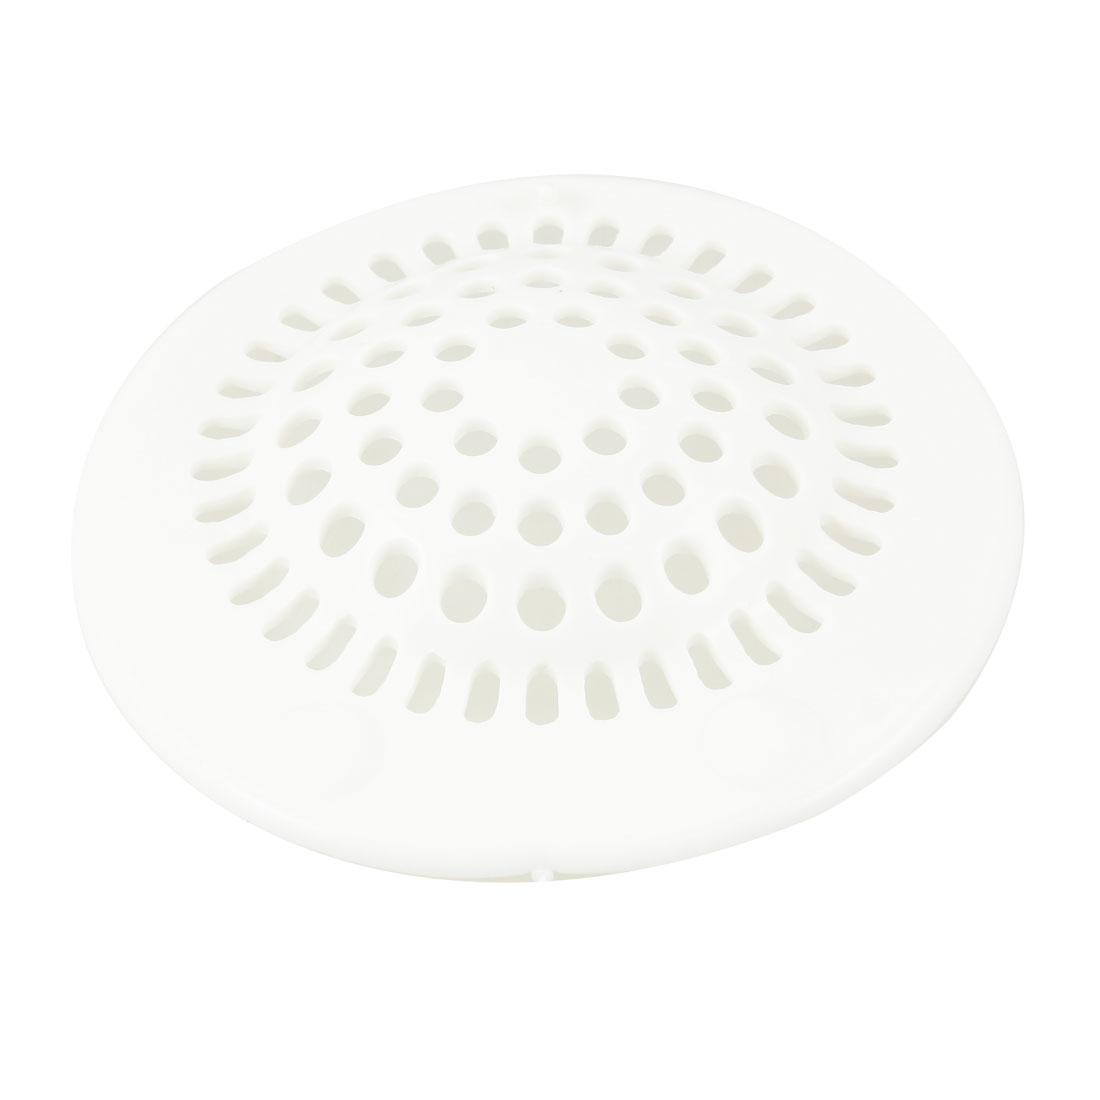 Bathroom 3.9 Sink Floor Drain Screen Hair Filtering Sticker White<br><br>Aliexpress